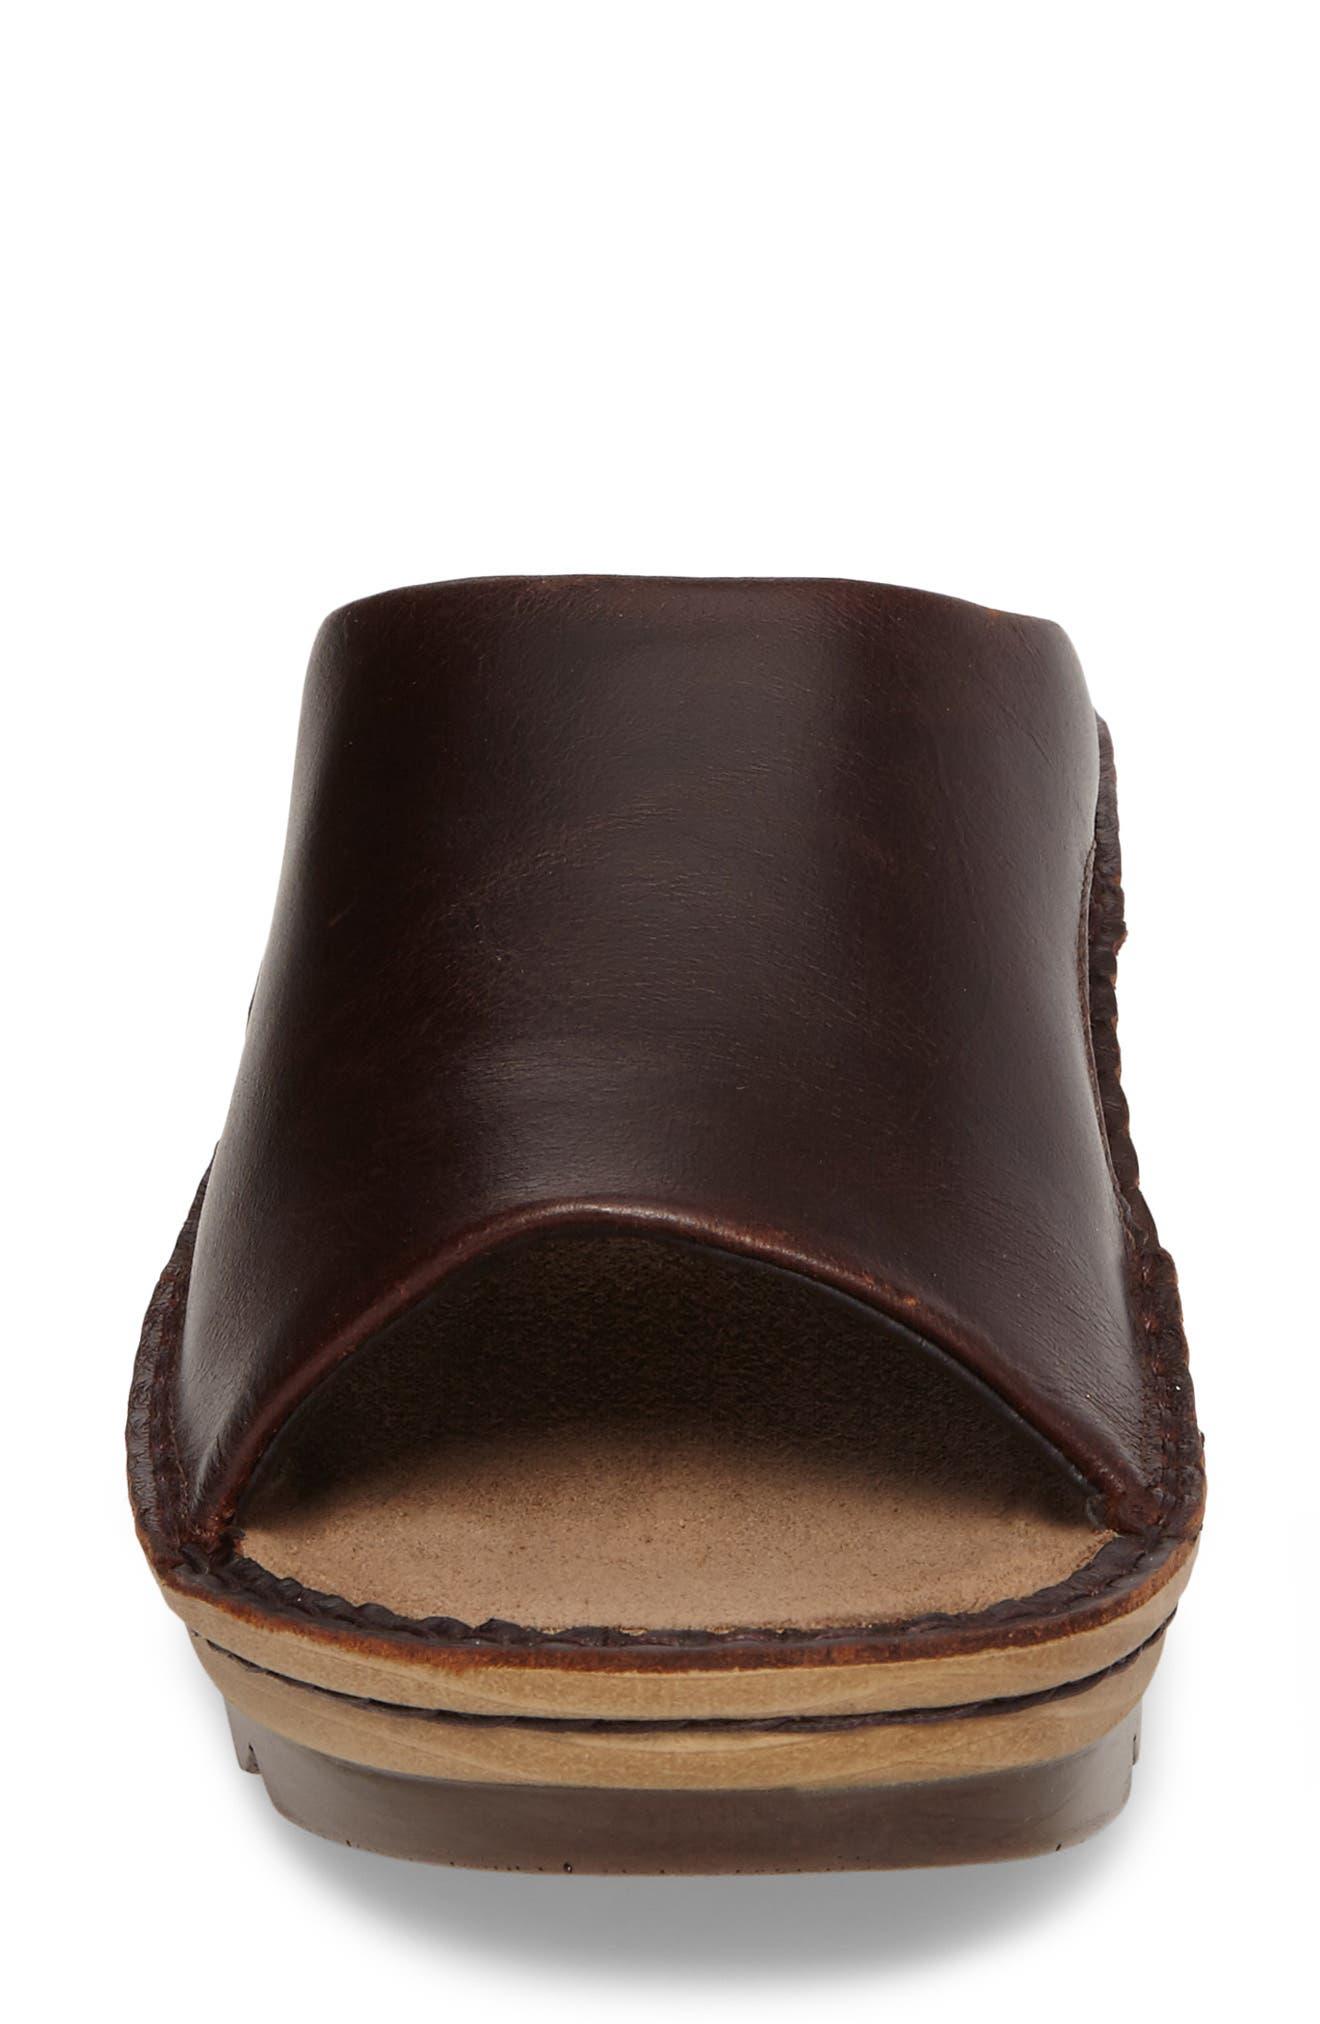 'Ardisia' Slide Sandal,                             Alternate thumbnail 4, color,                             Buffalo Leather